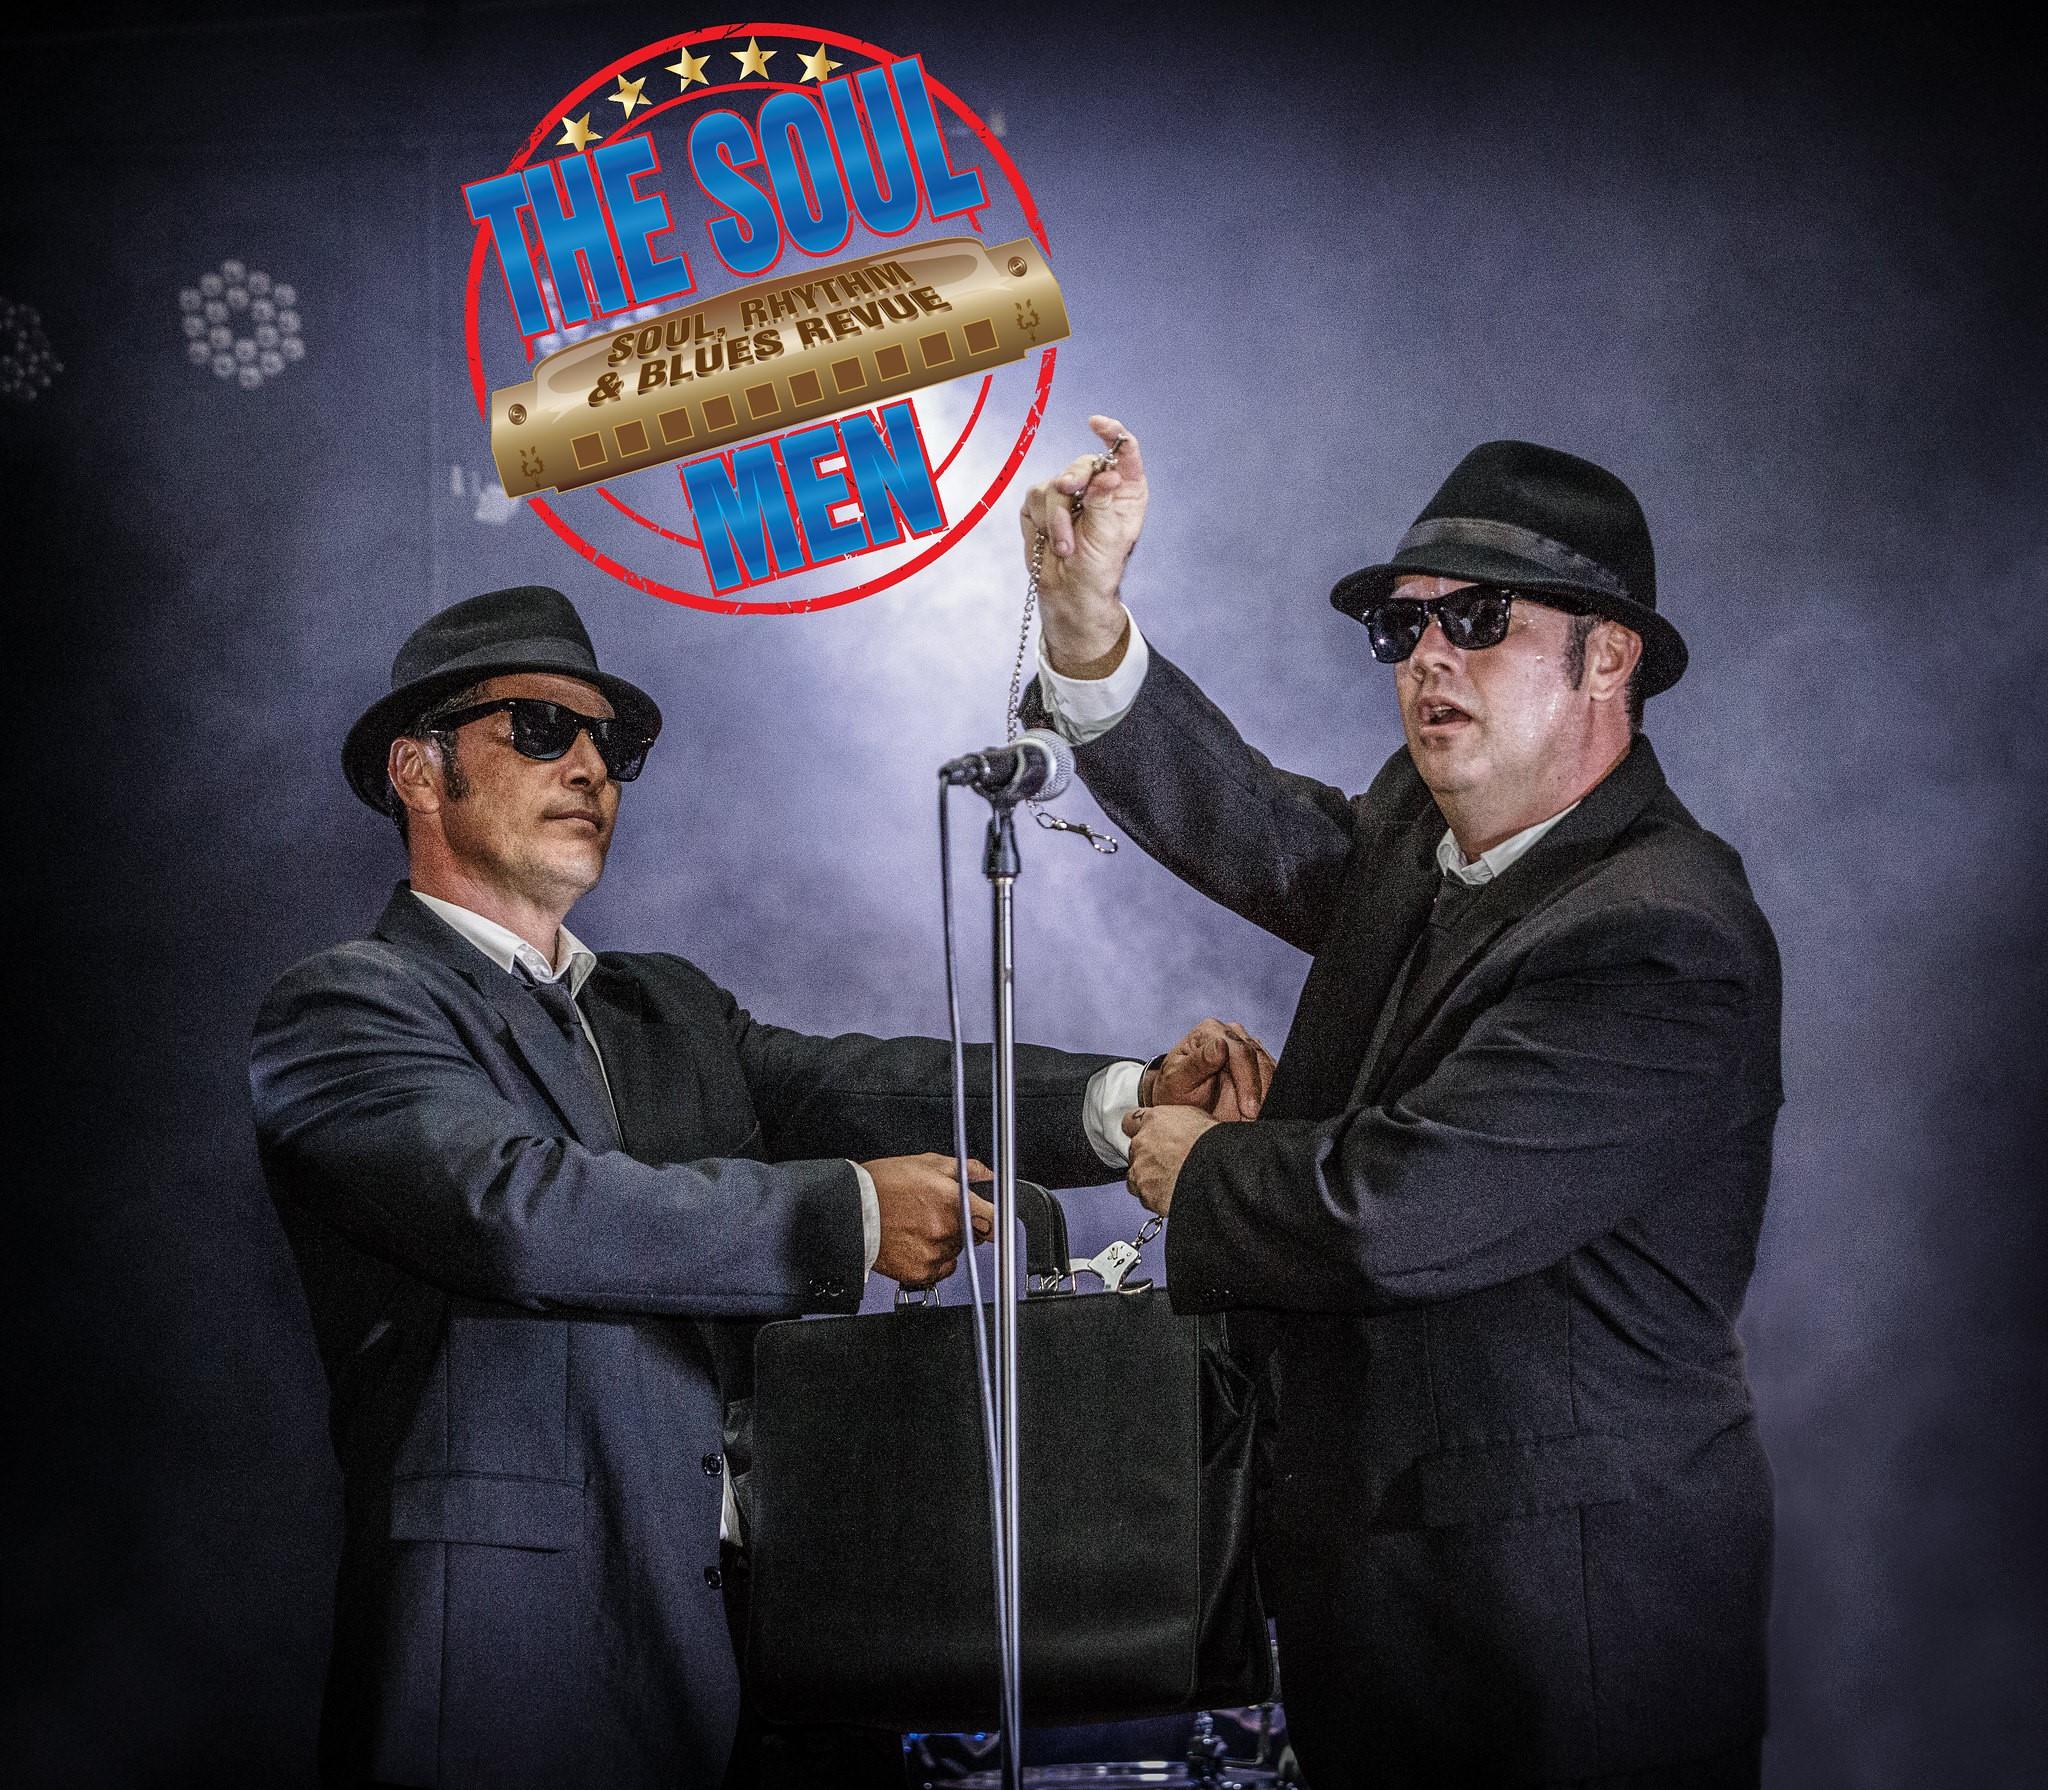 the-soulmen-band-leftys-old-time-musical.jpg